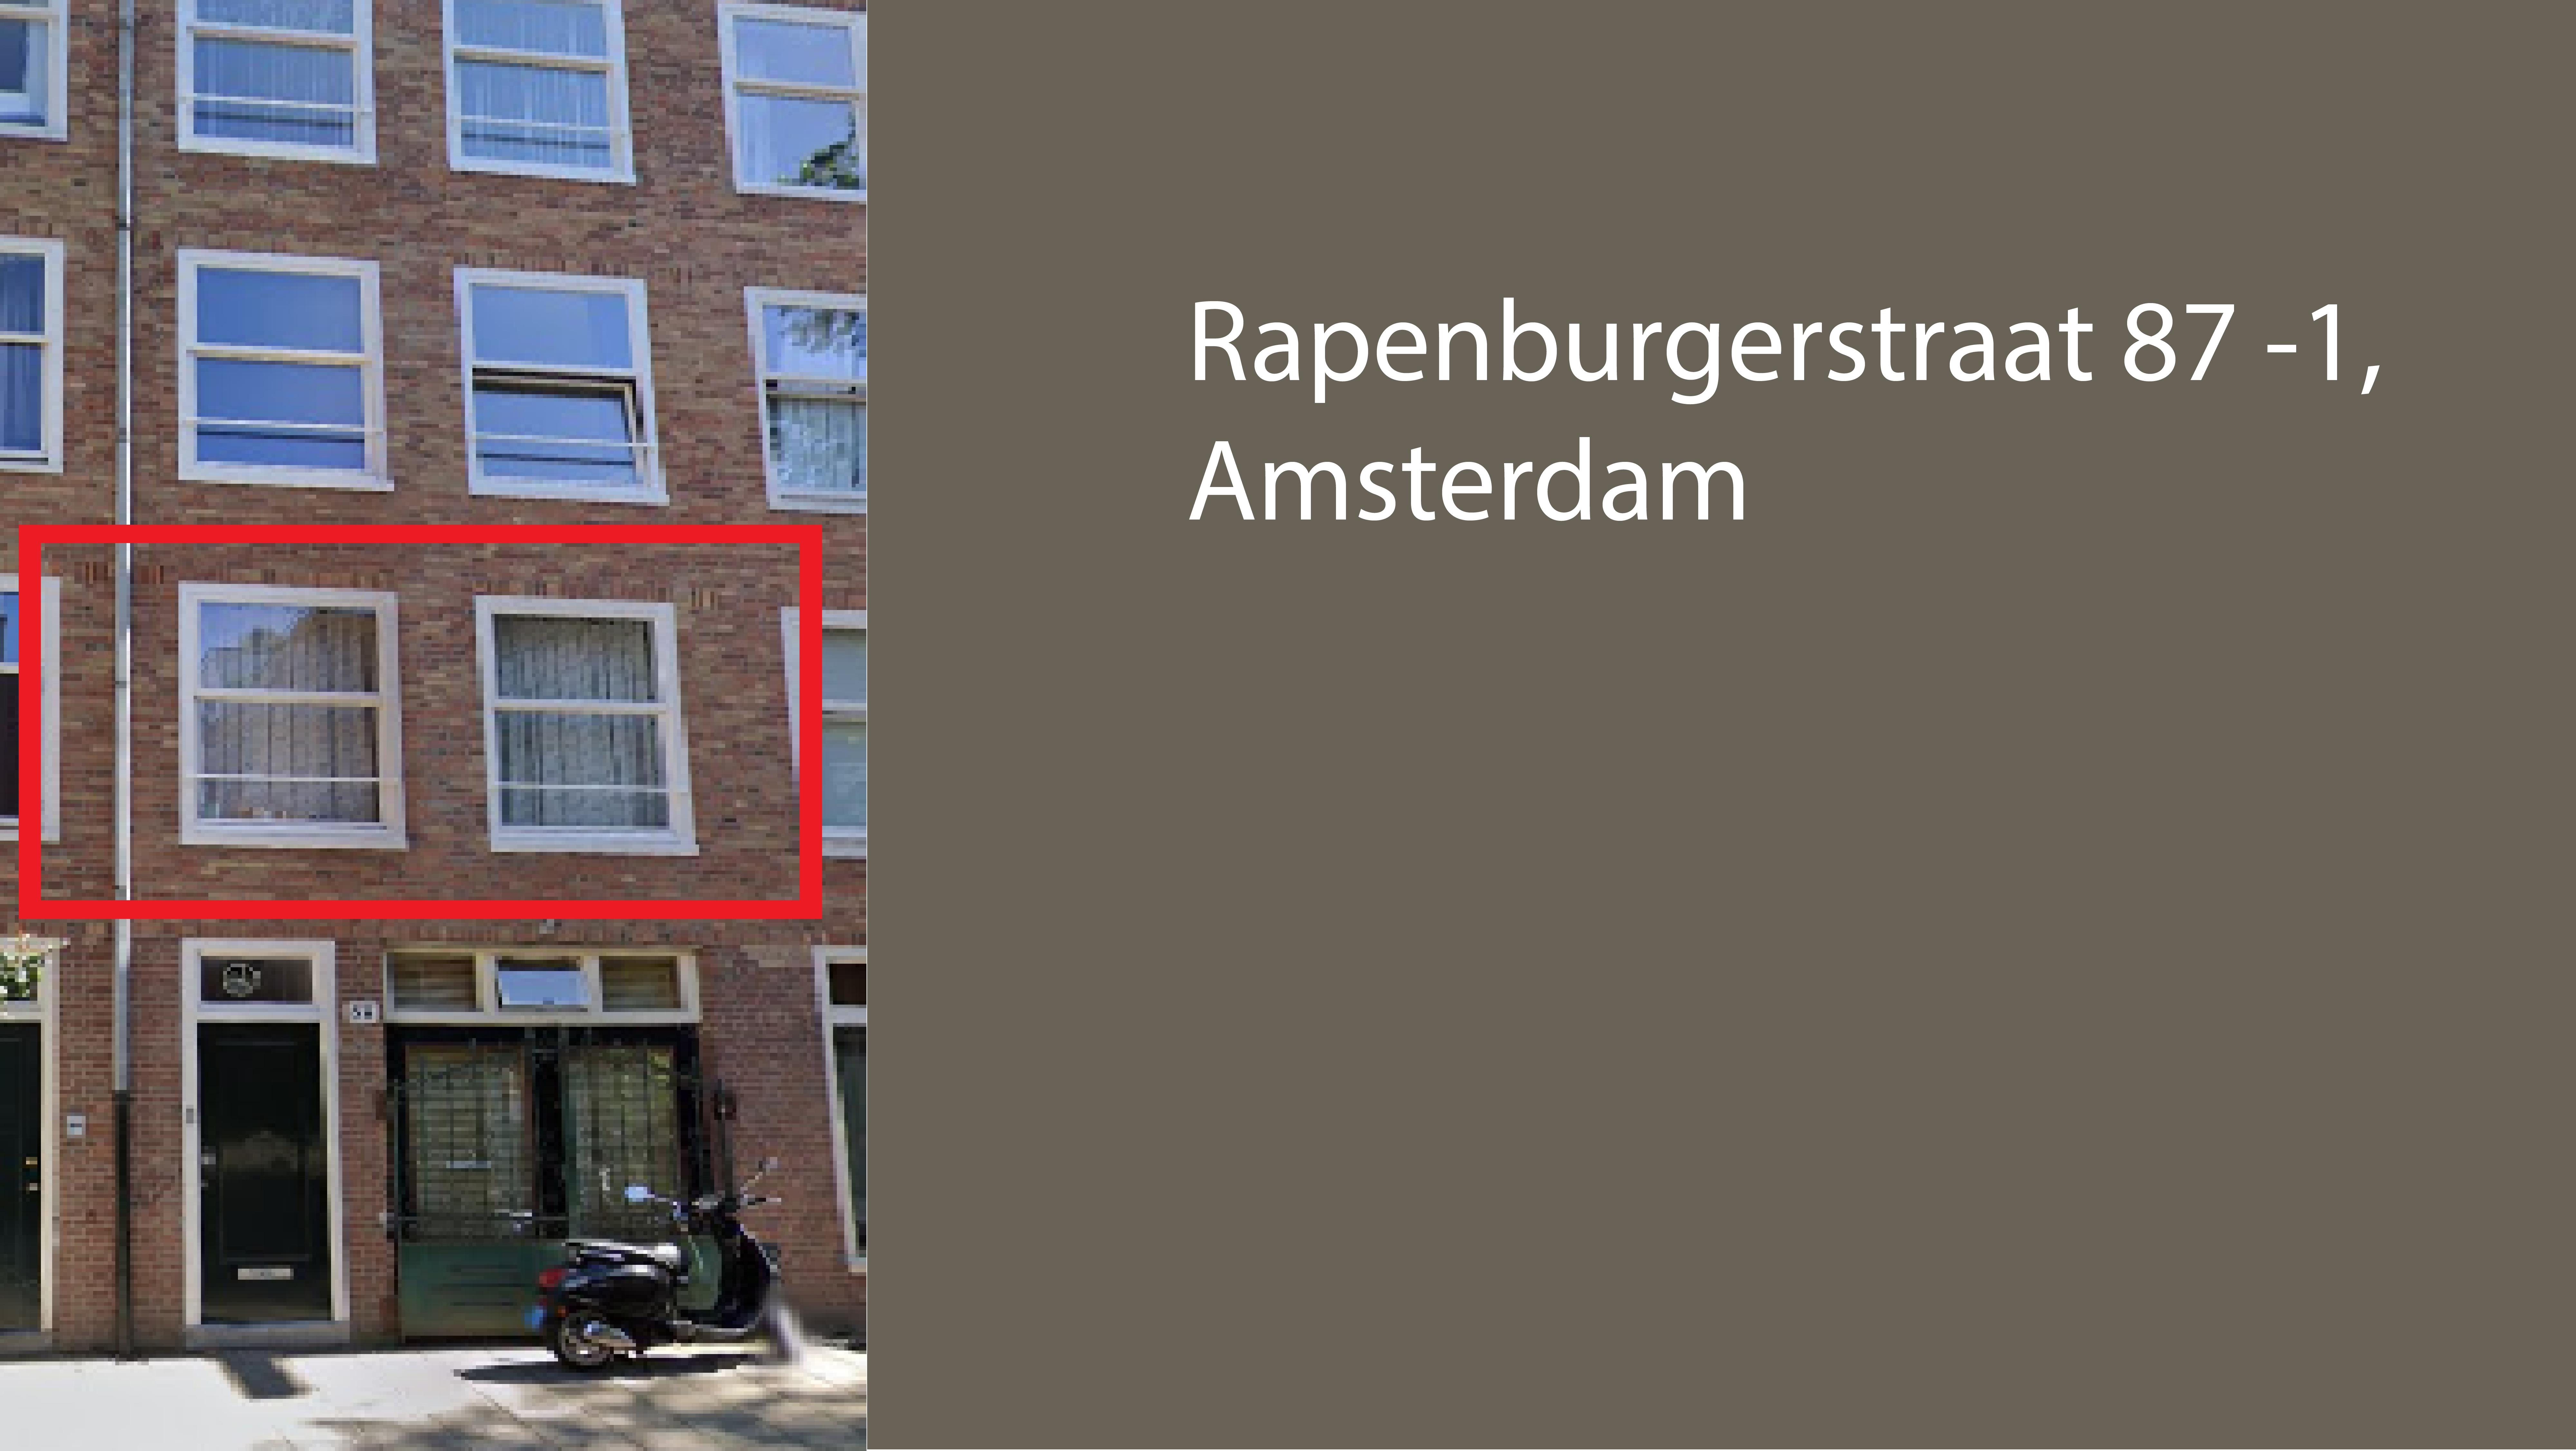 Rapenburgstraat 87 1